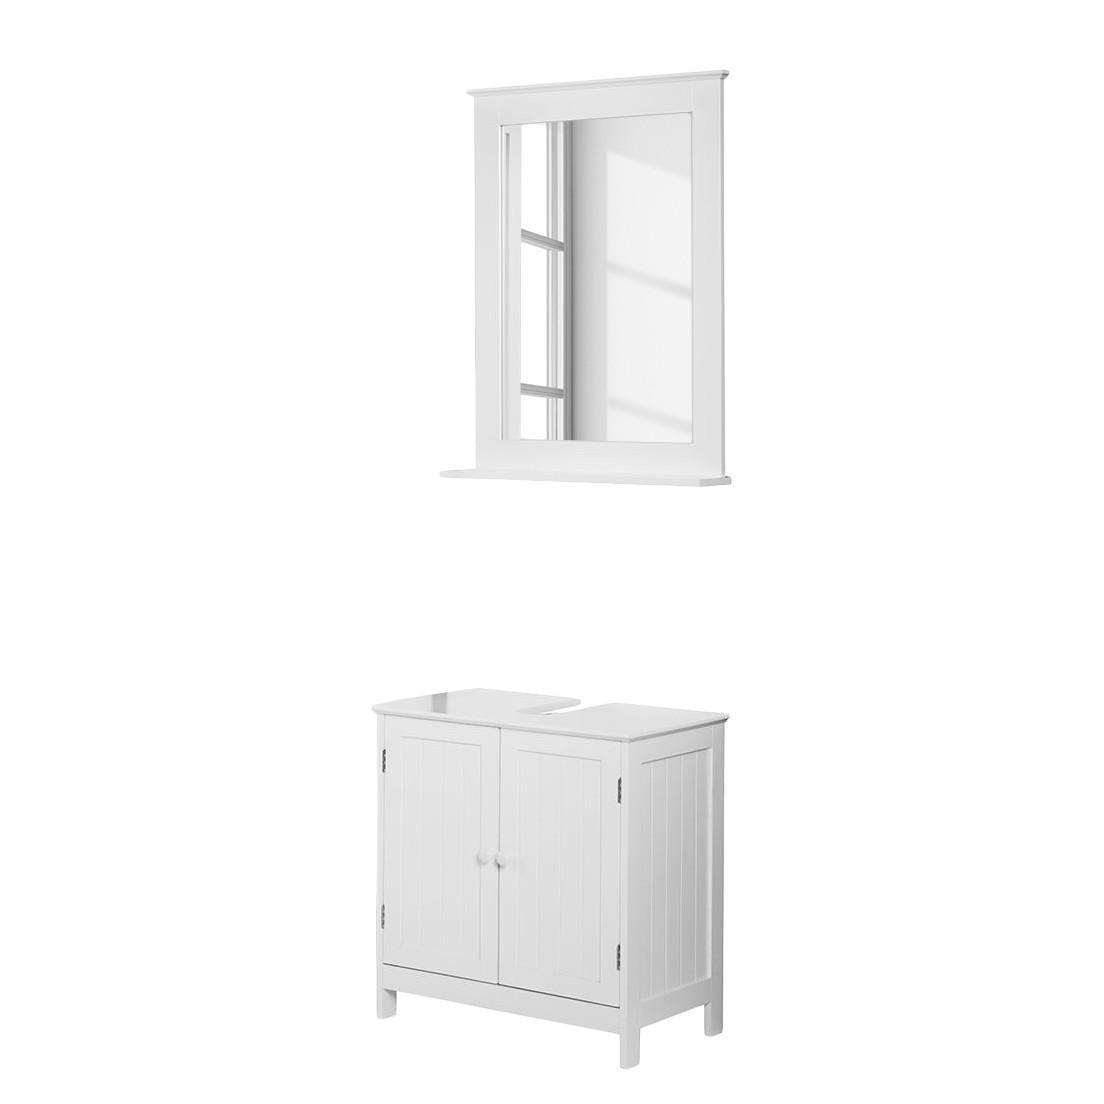 Ensemble Turin - Blanc - 2 éléments : meuble lavabo, armoire à miroir, California